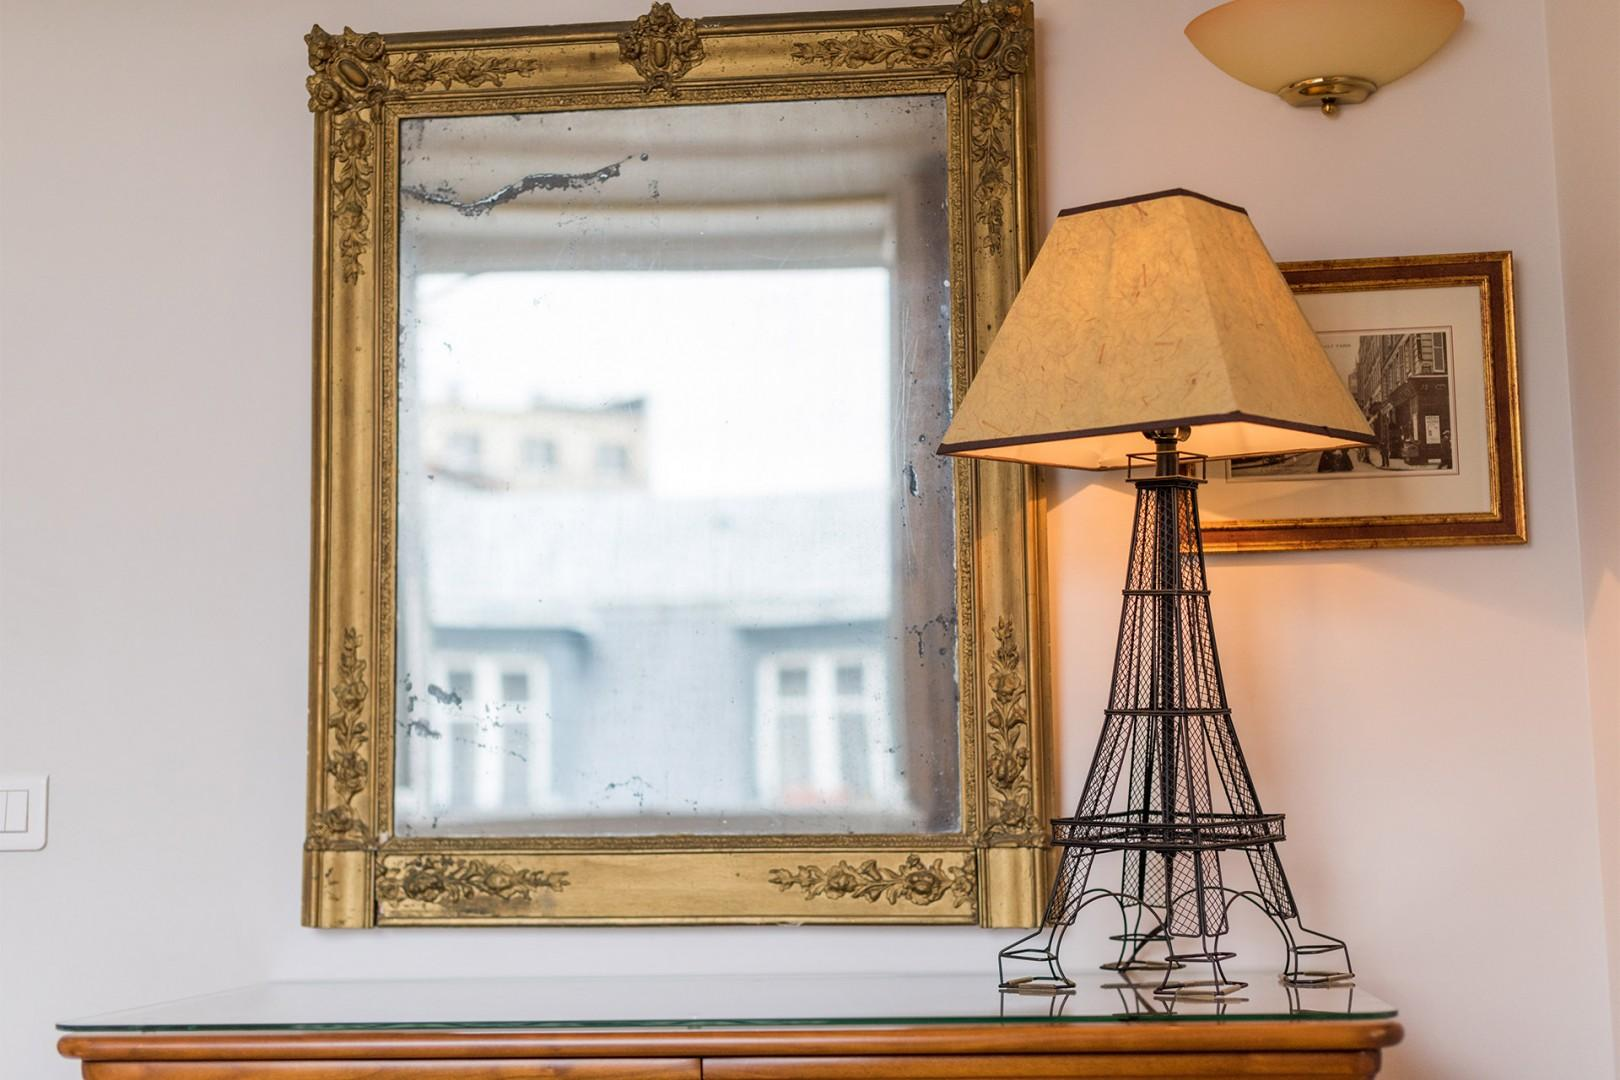 Parisian touches are found throughout the apartment.